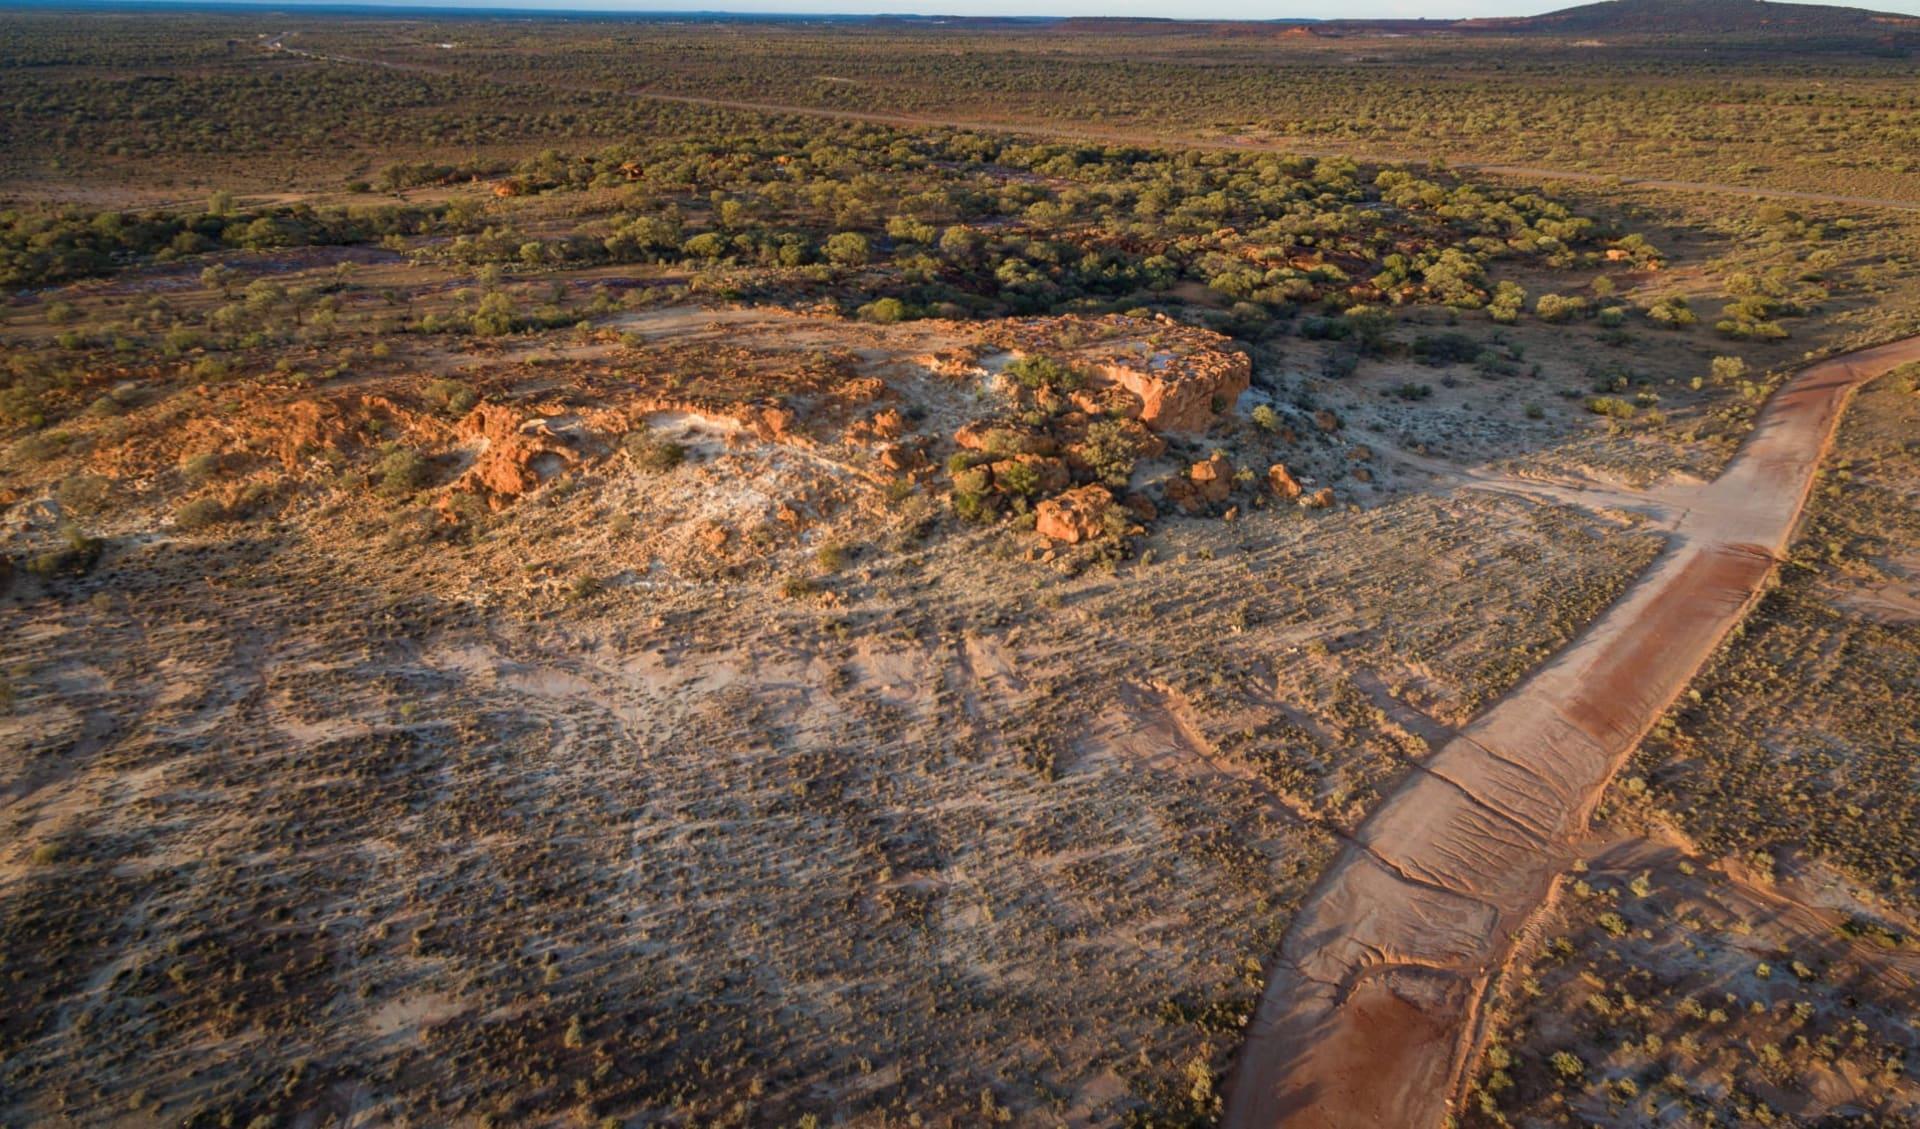 Canning Stock Route ab Perth: Luftaufnahme von rotem Ocker